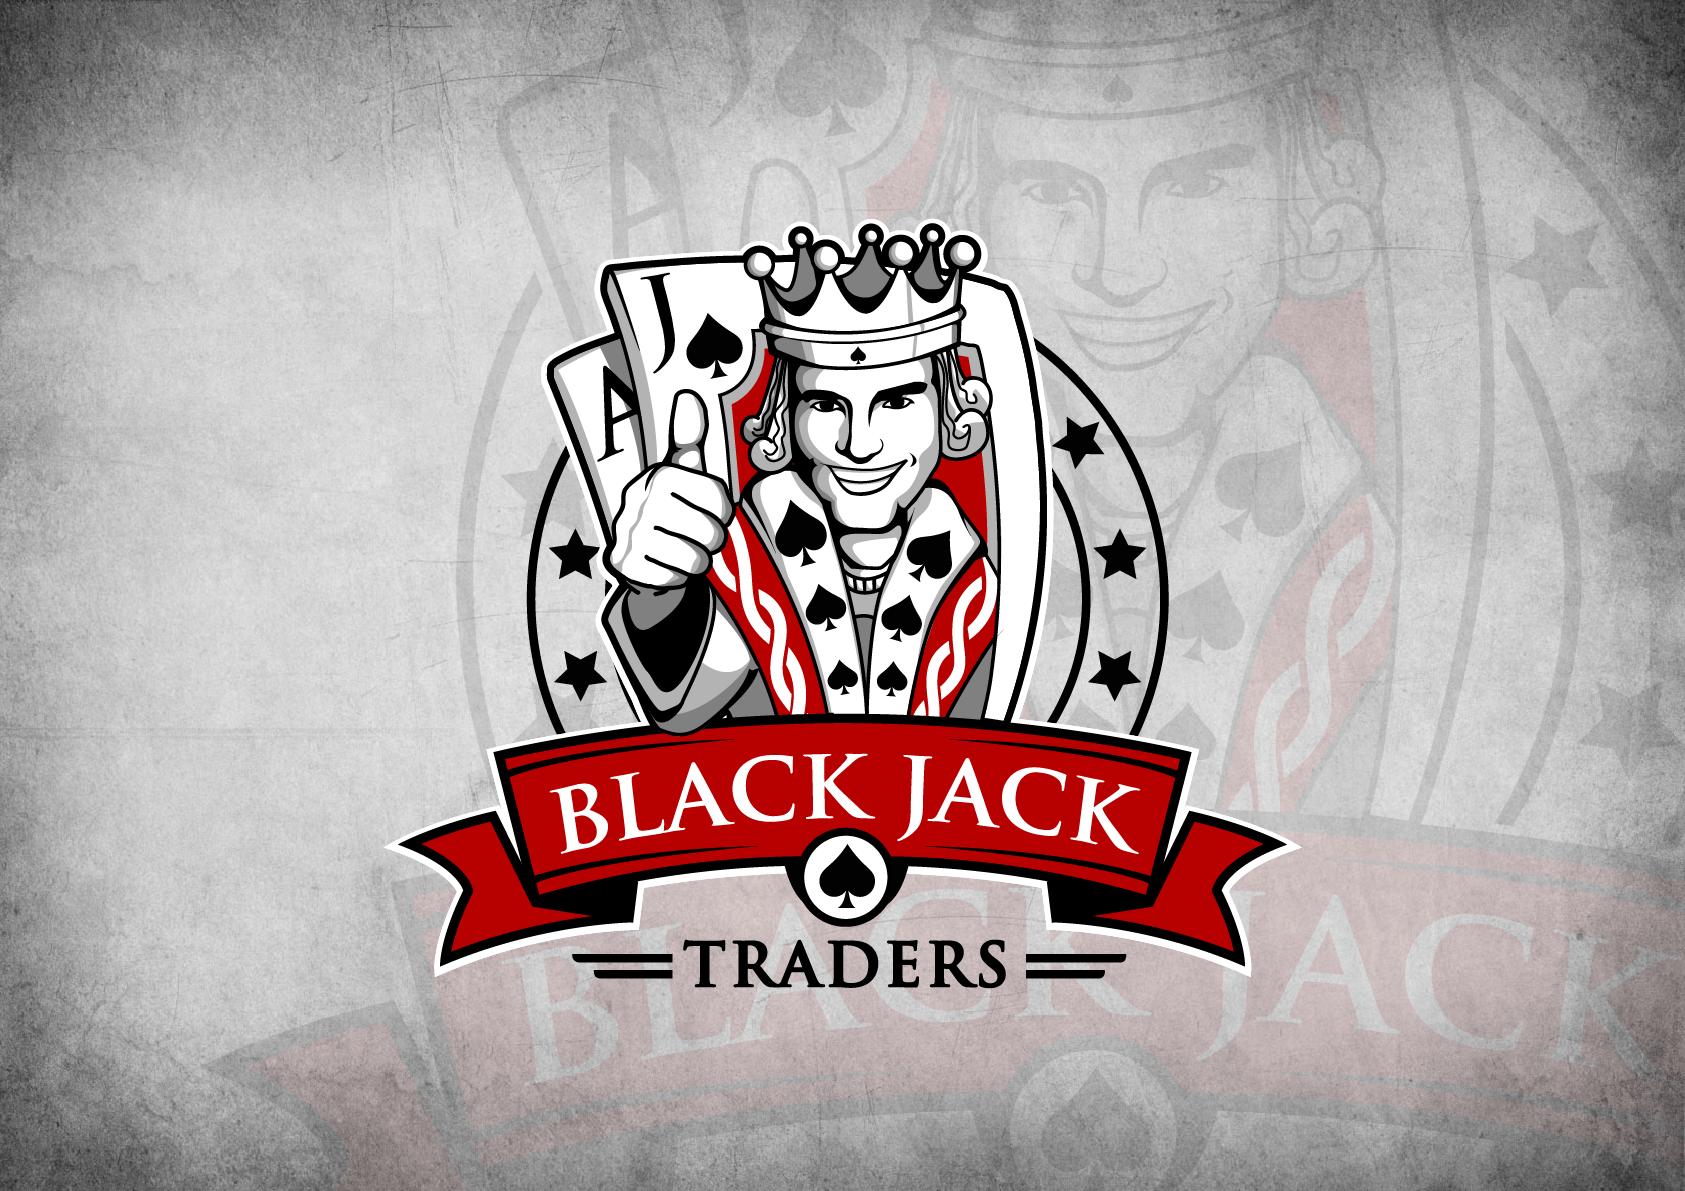 Re-imagine the Blackjack Traders logo